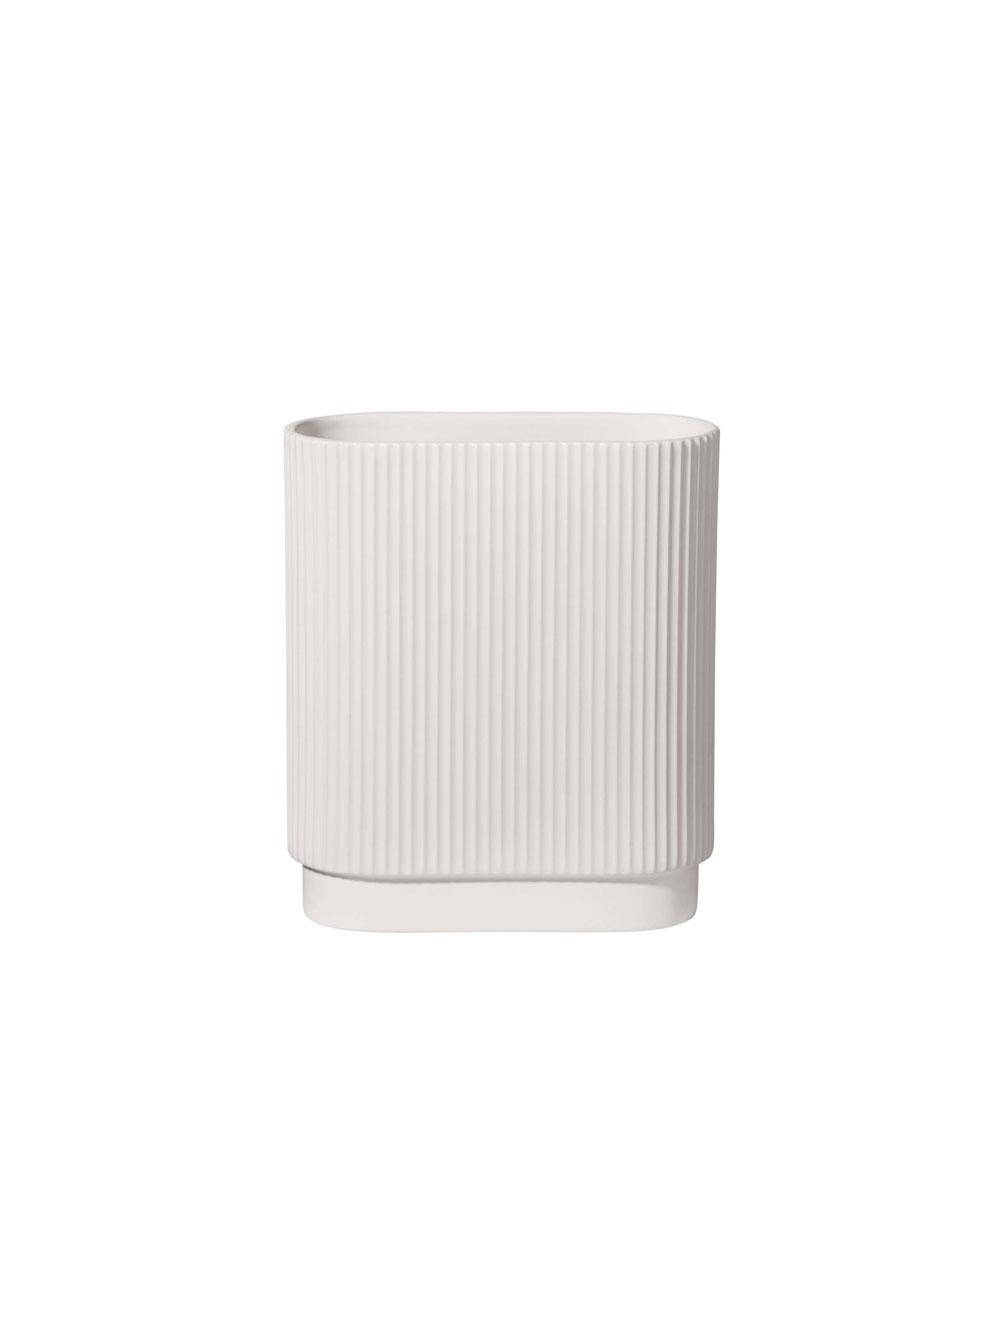 Artdeco Vase